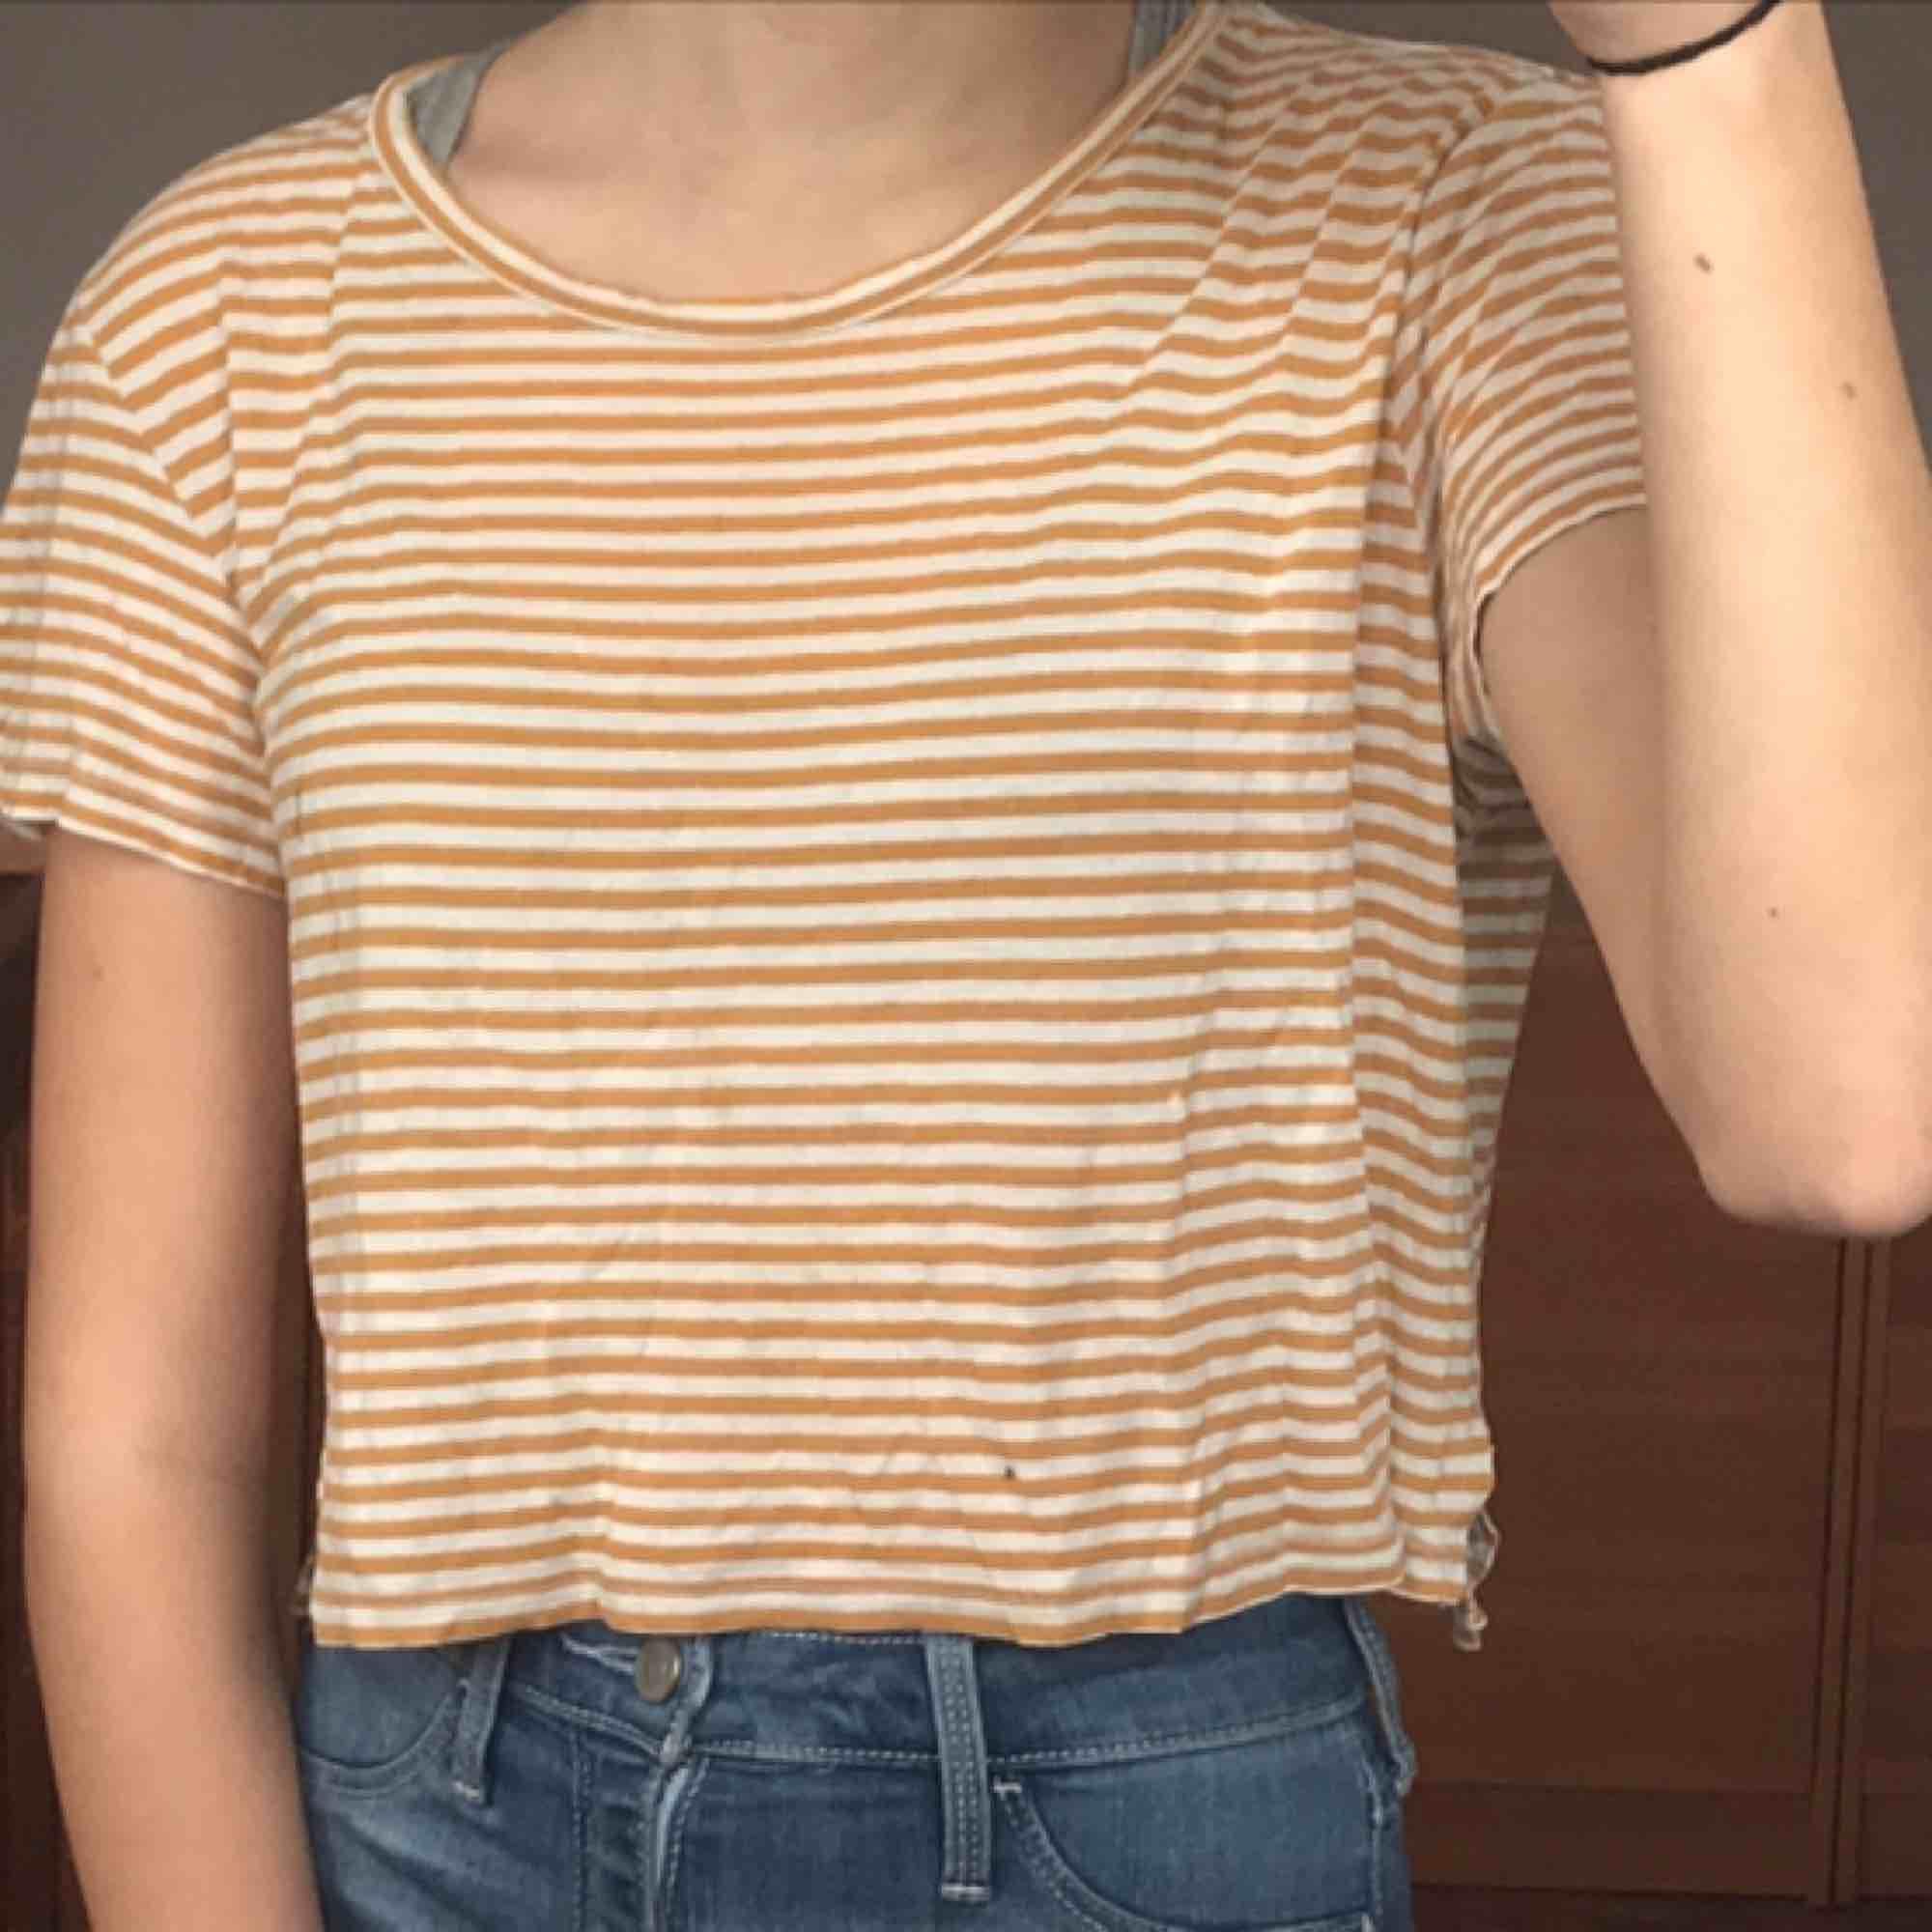 T-shirt från monki🙌. T-shirts.